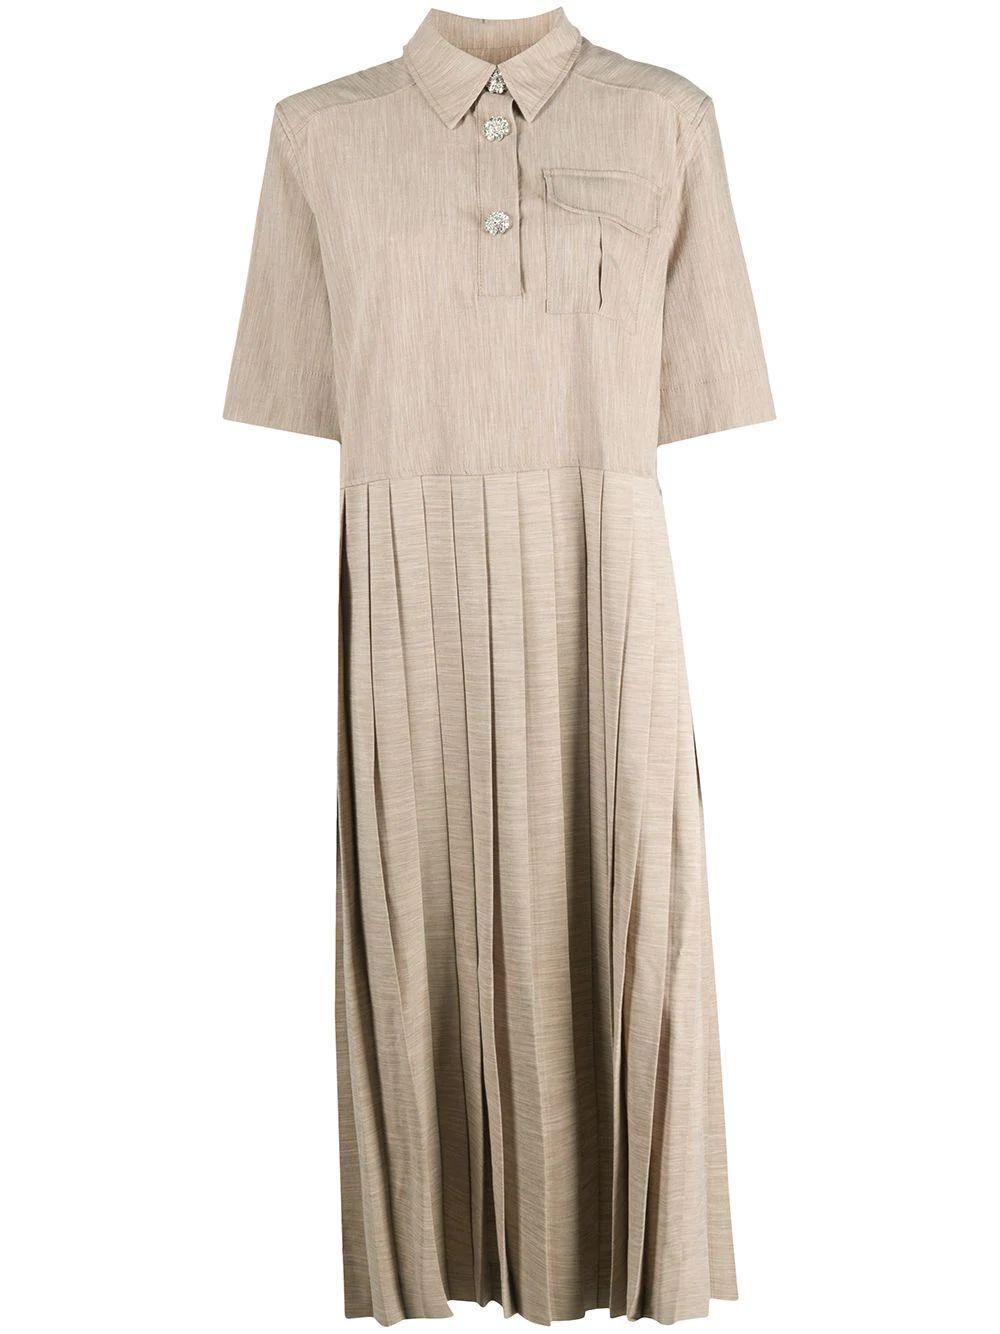 Melange Suiting Shirt Dress Item # F5057